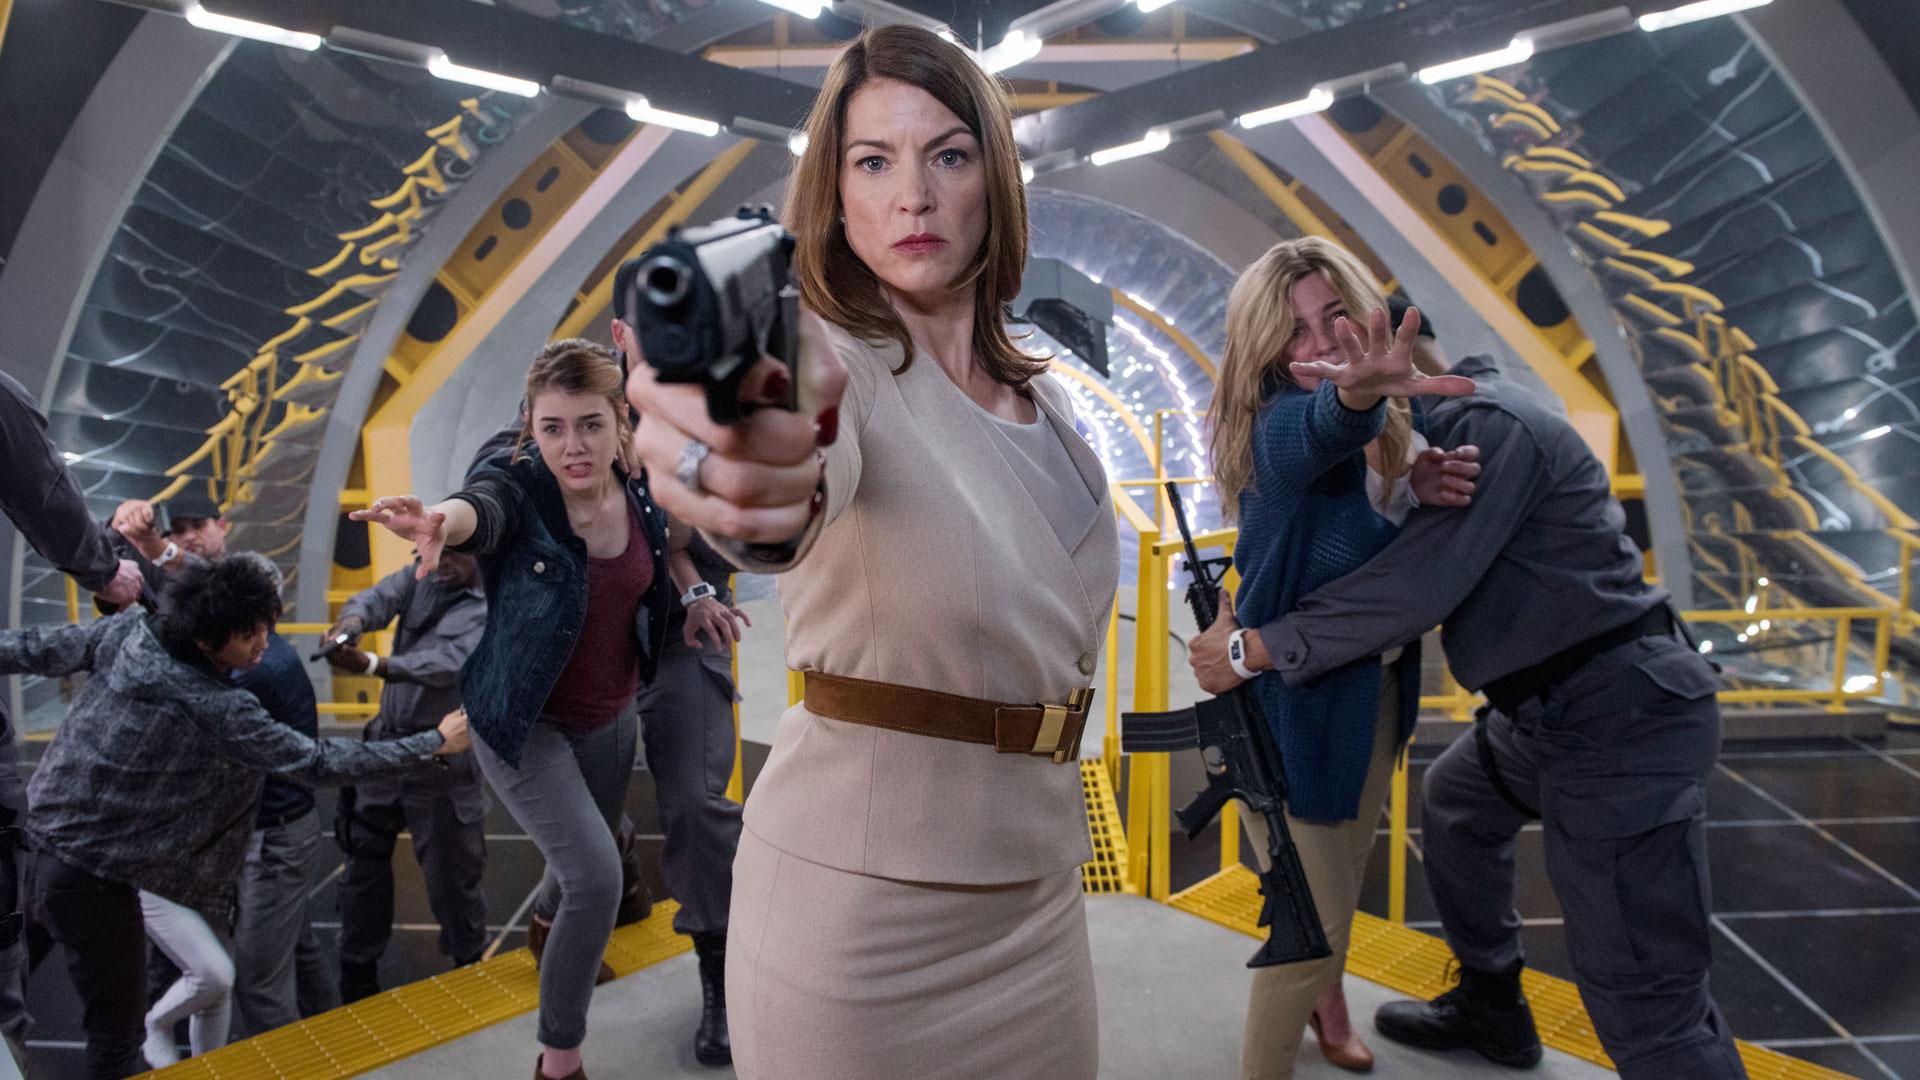 Heroes Reborn: Rya Kihlstedt è Erica nella puntata Project Reborn